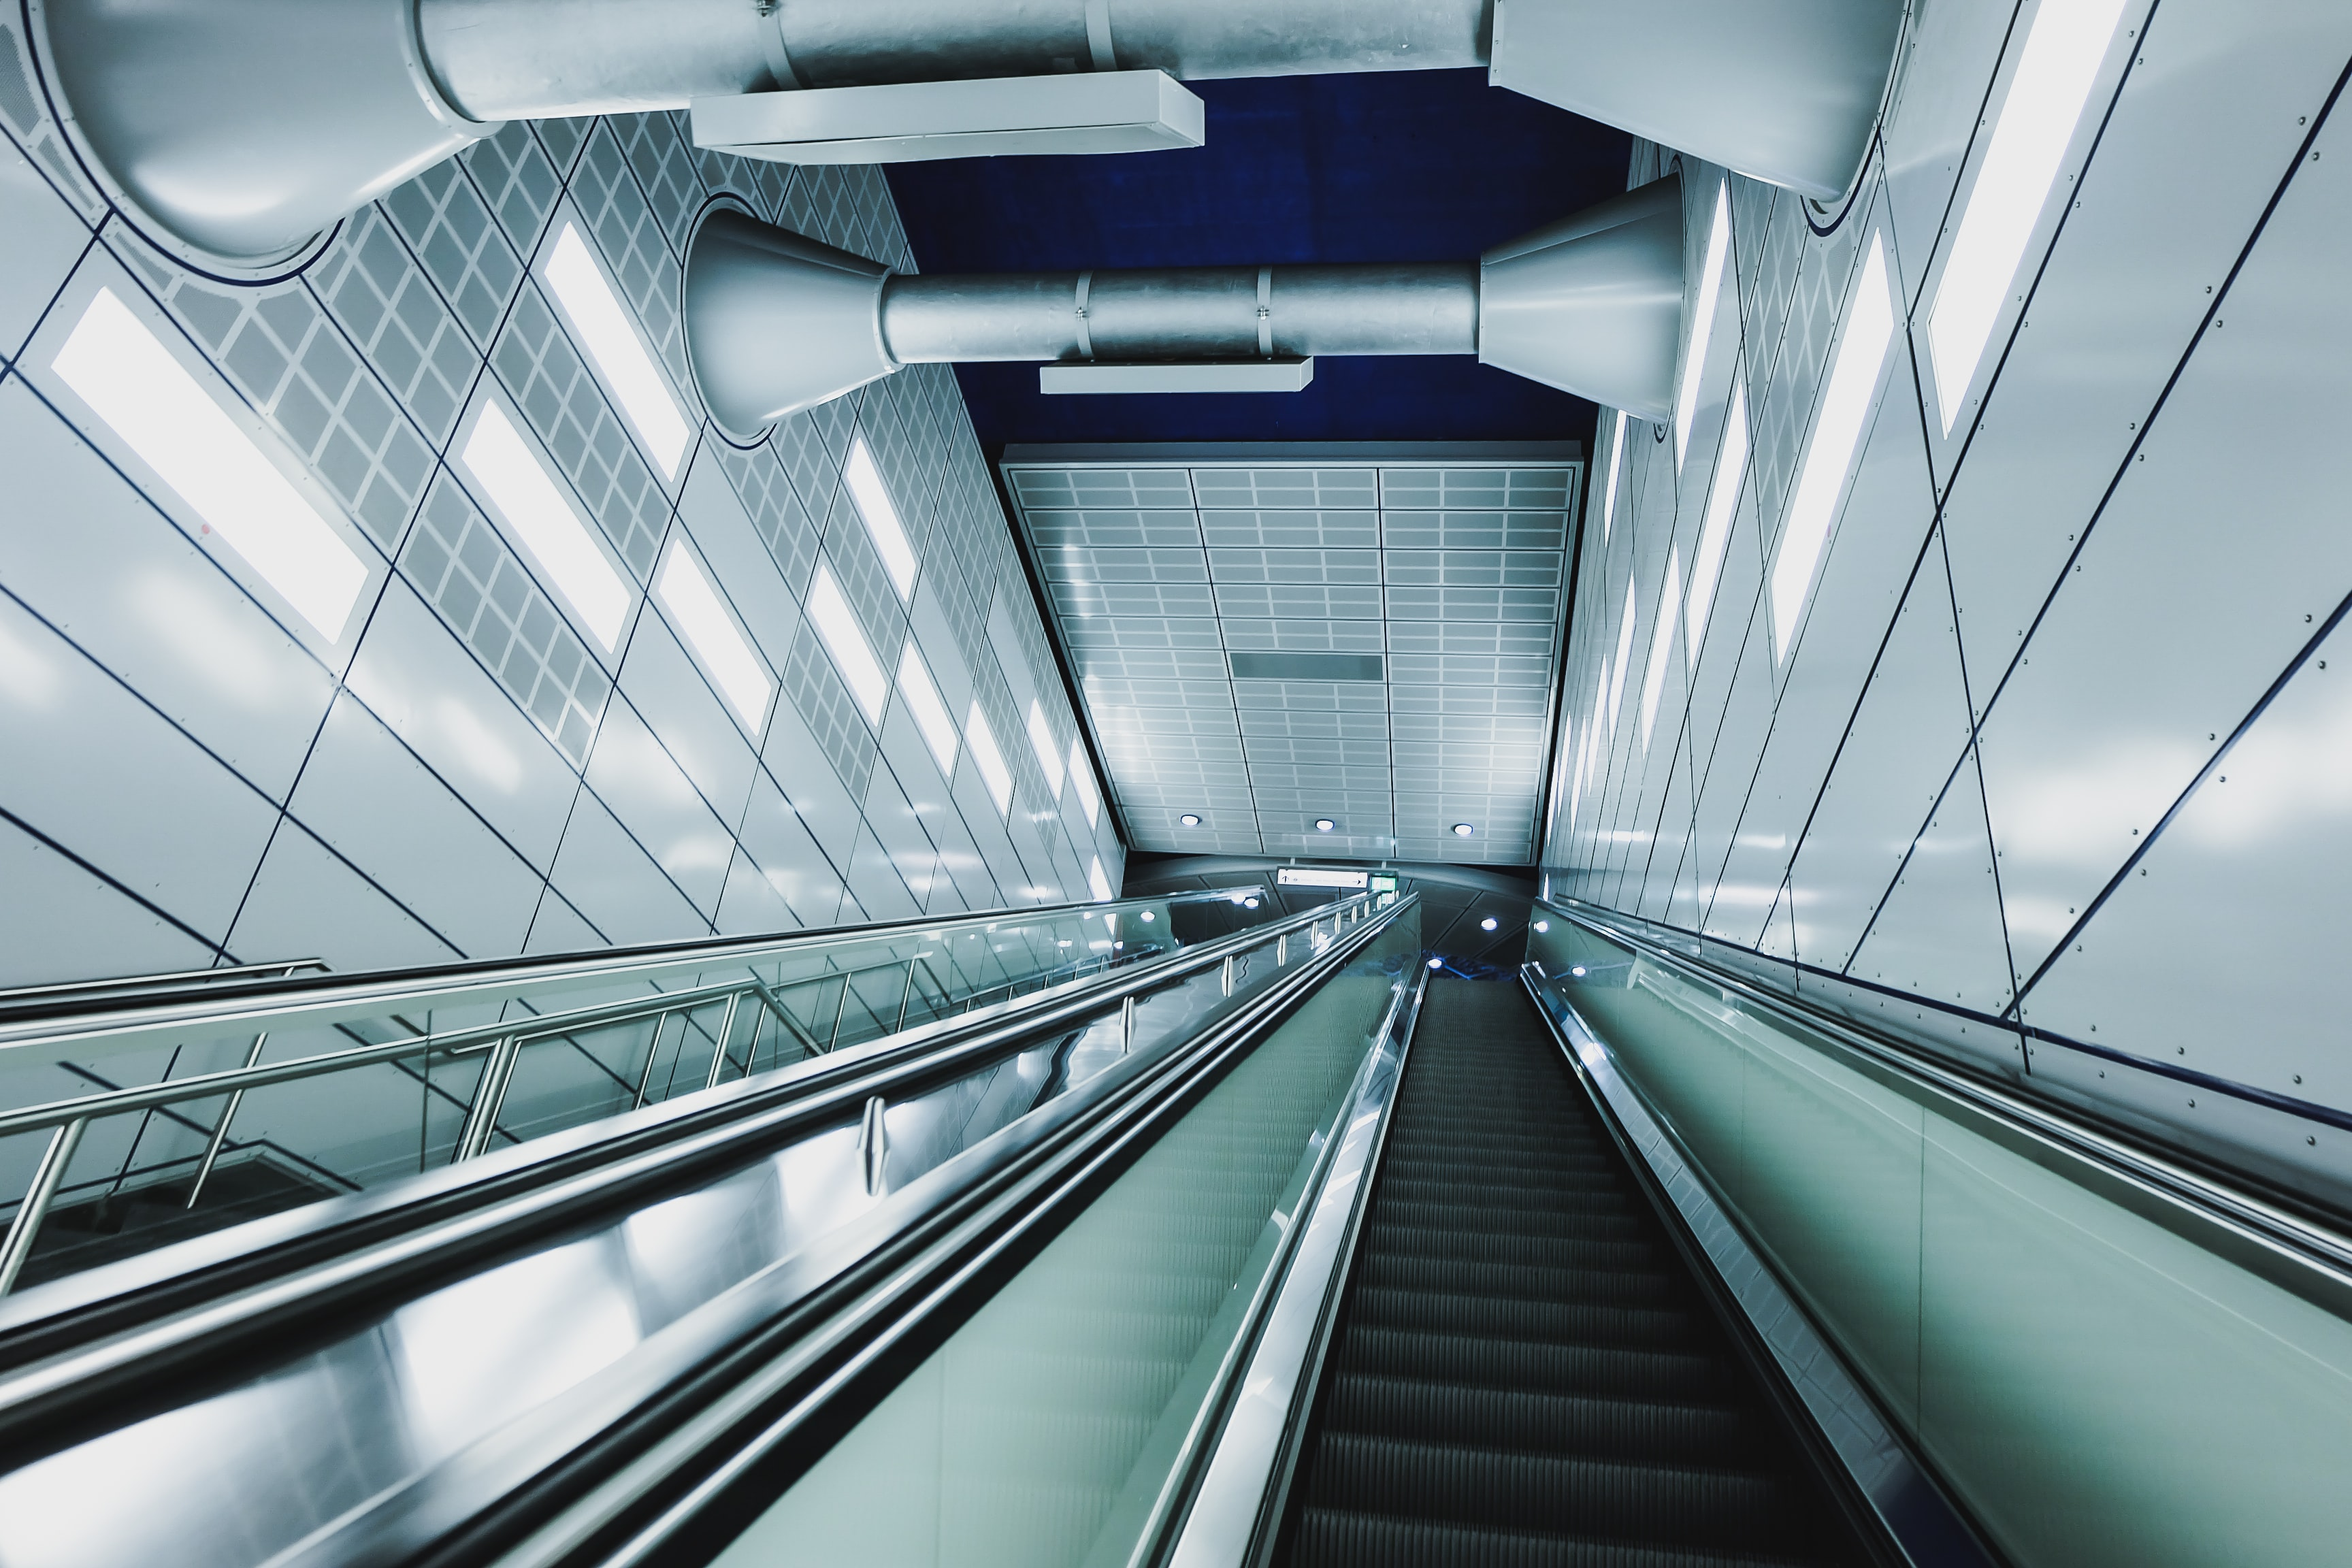 black escalator